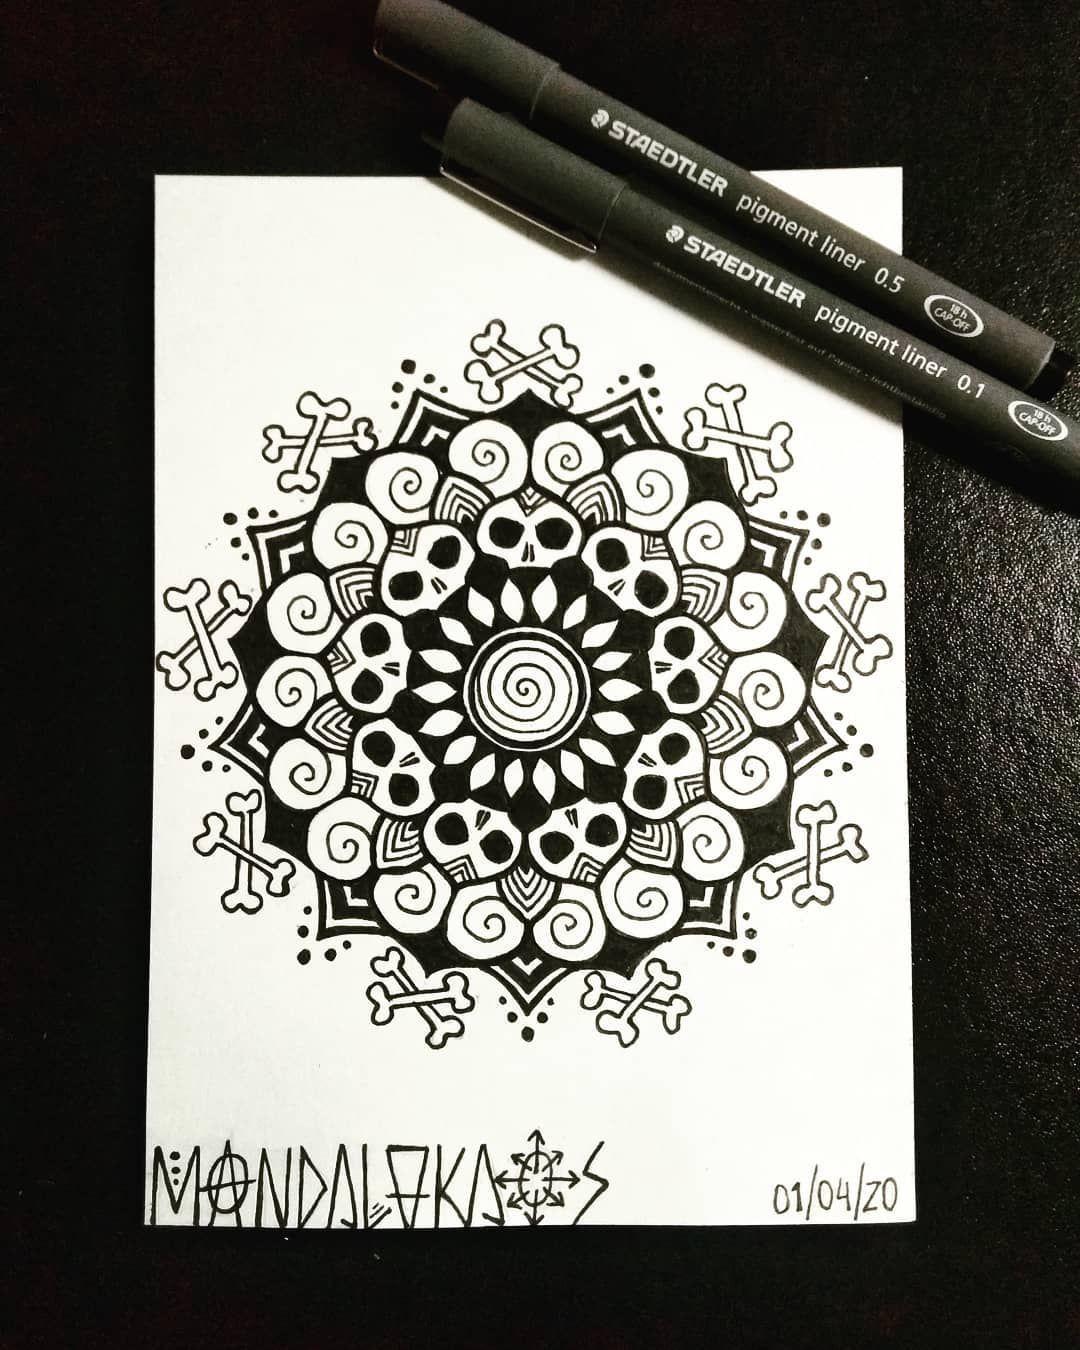 Mini mandala 💀 Thankxxx for the trust @cosmocop96 . . . #mandalas #mandalakaos #pirates #skulls #skulllover #blackwork #blackandwhite #mandala_art #mandala_addict #mandala_sharing #mandala_universe #mandalartist #mandaladesign #finelinermarkers